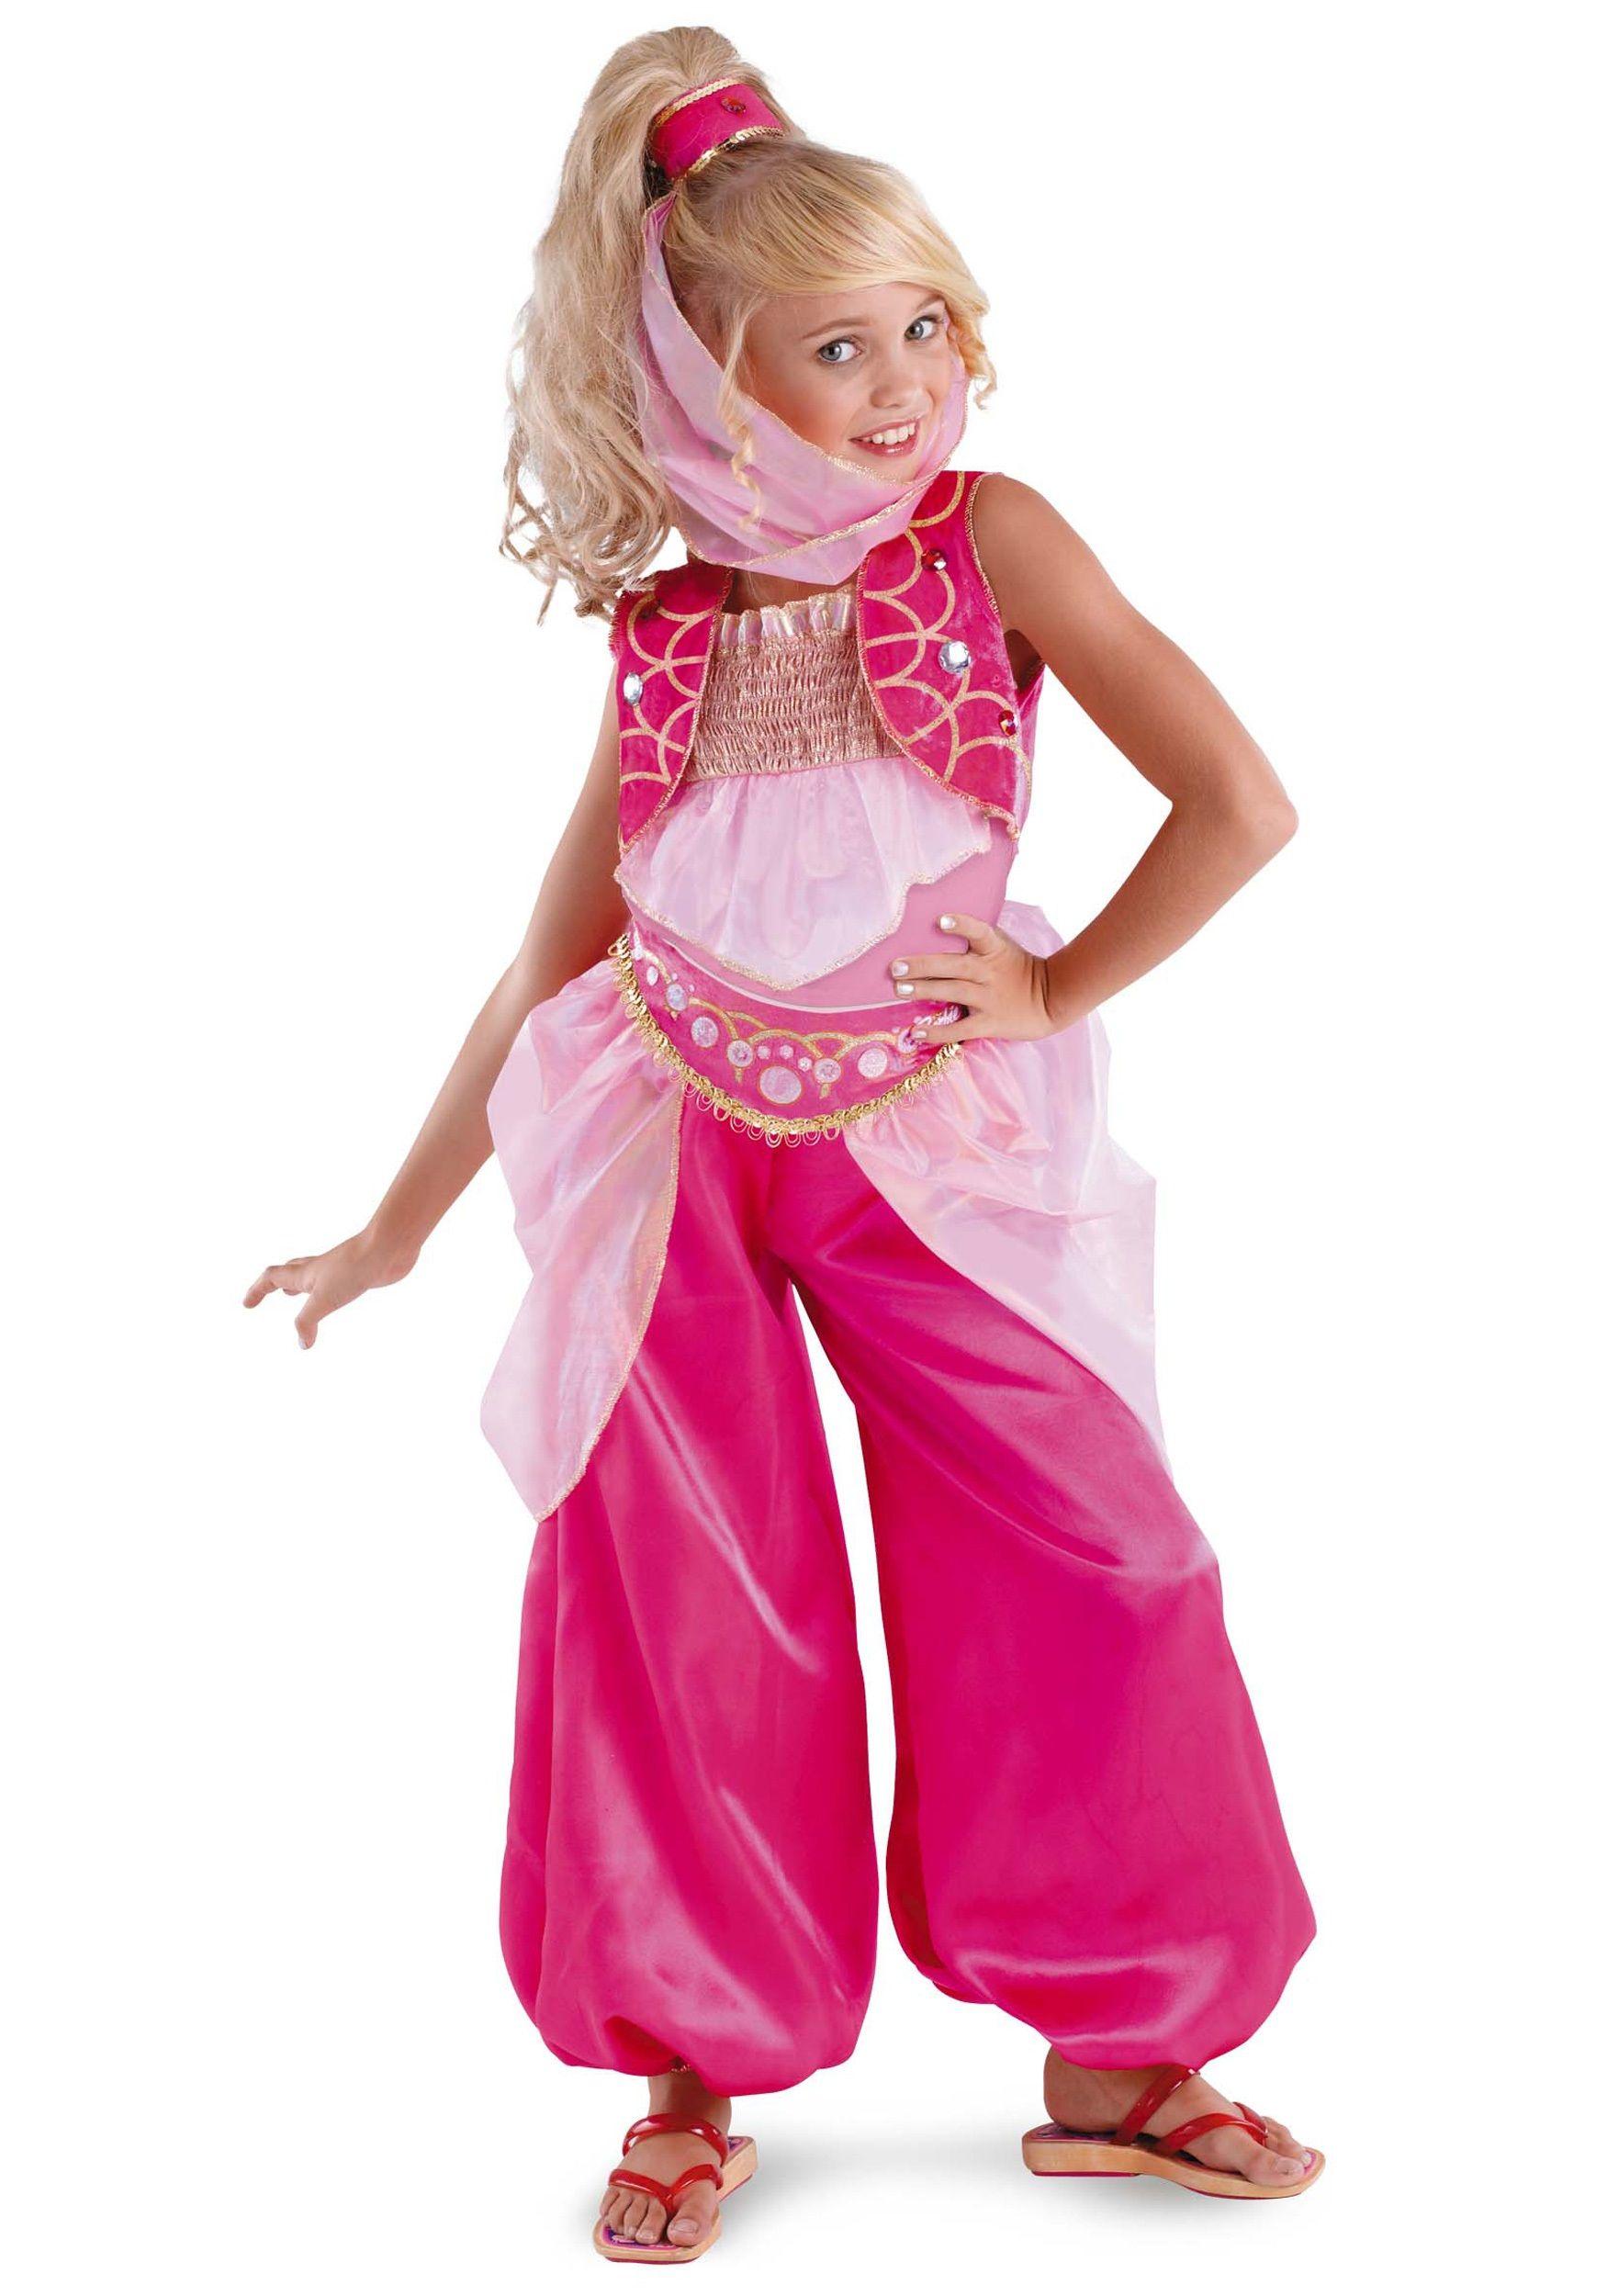 barbie genie costume - Buscar con Google  sc 1 st  Pinterest & barbie genie costume - Buscar con Google   arabesca   Pinterest ...